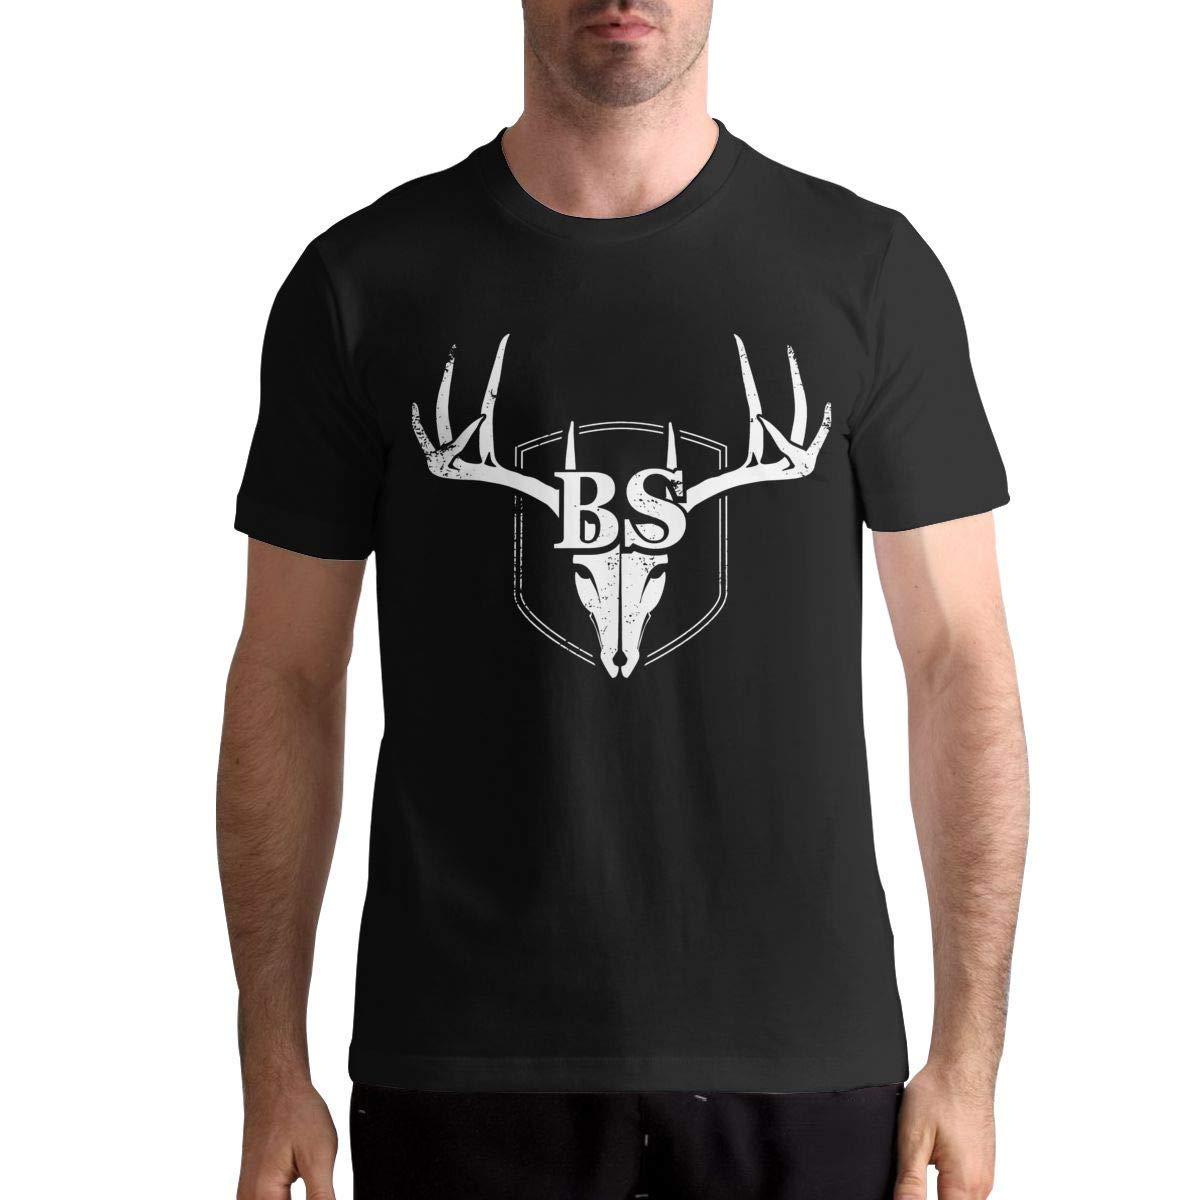 Blake Shelton T Shirt S T Shirt Fashion Tops Round Neck Short Sleeve Tee